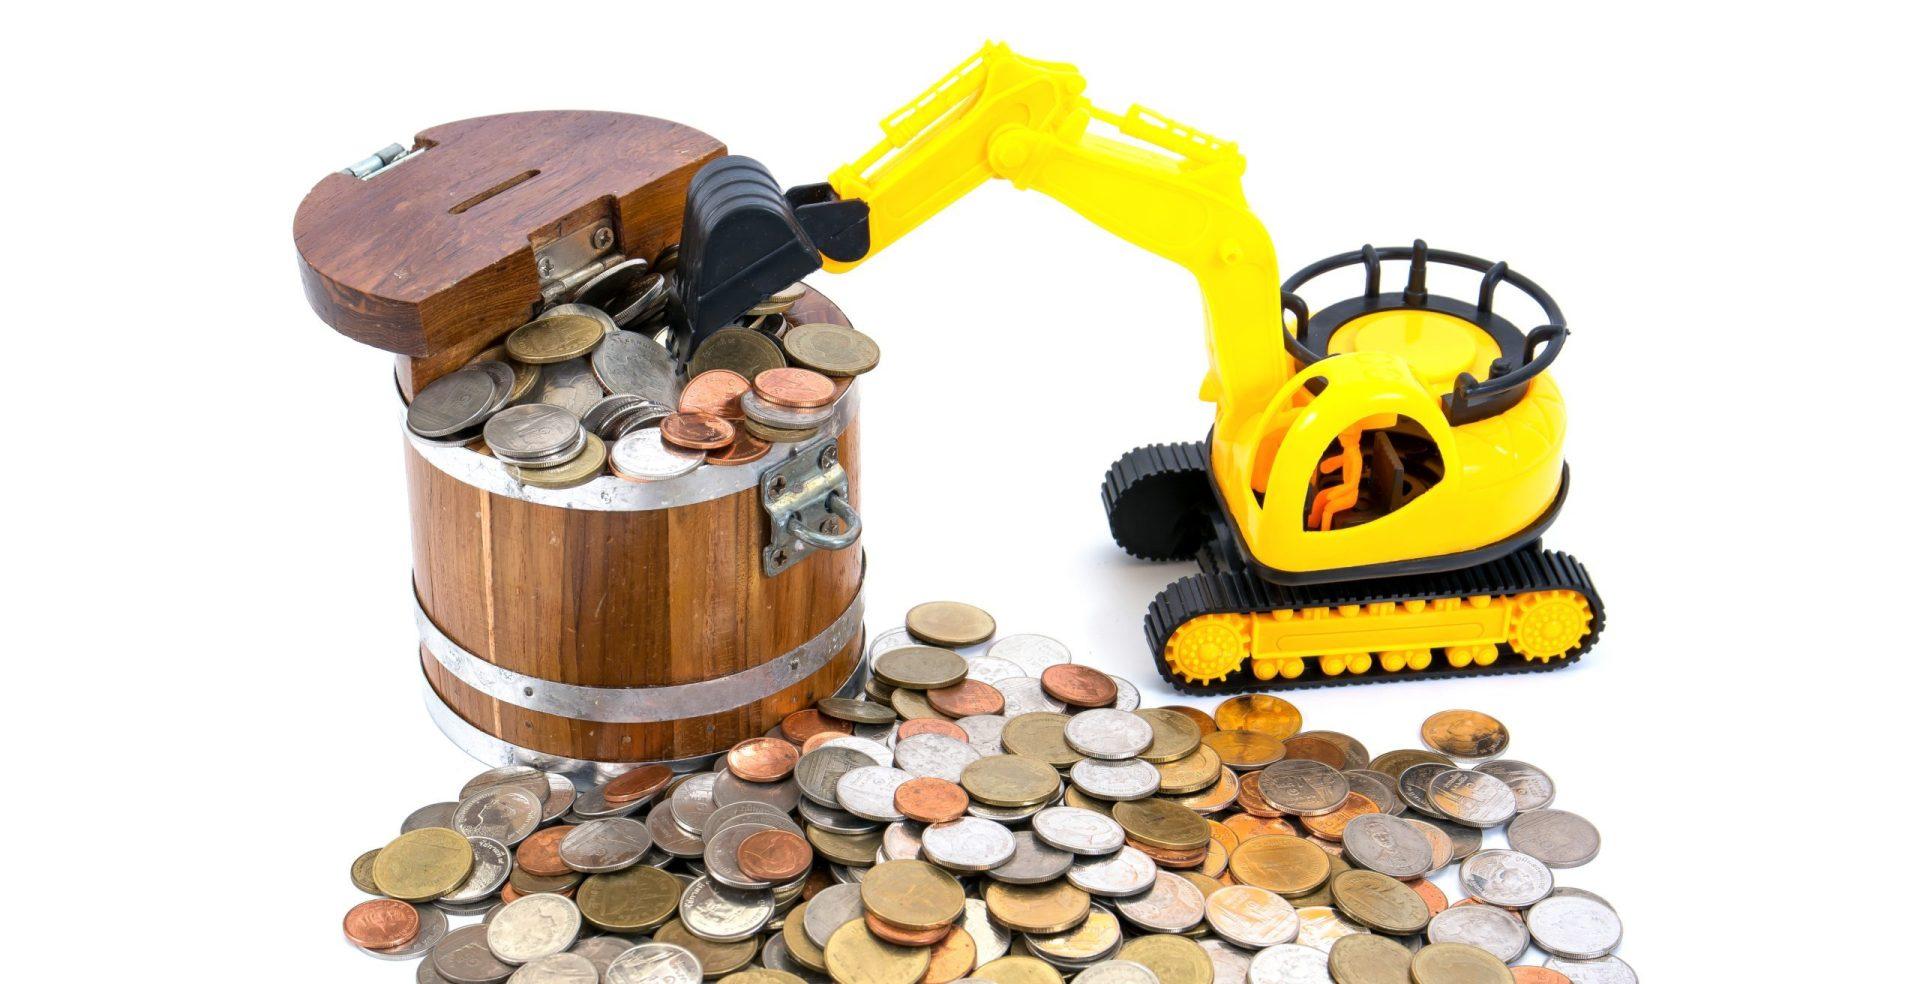 Case Study: Employment v Self-Employment Costs